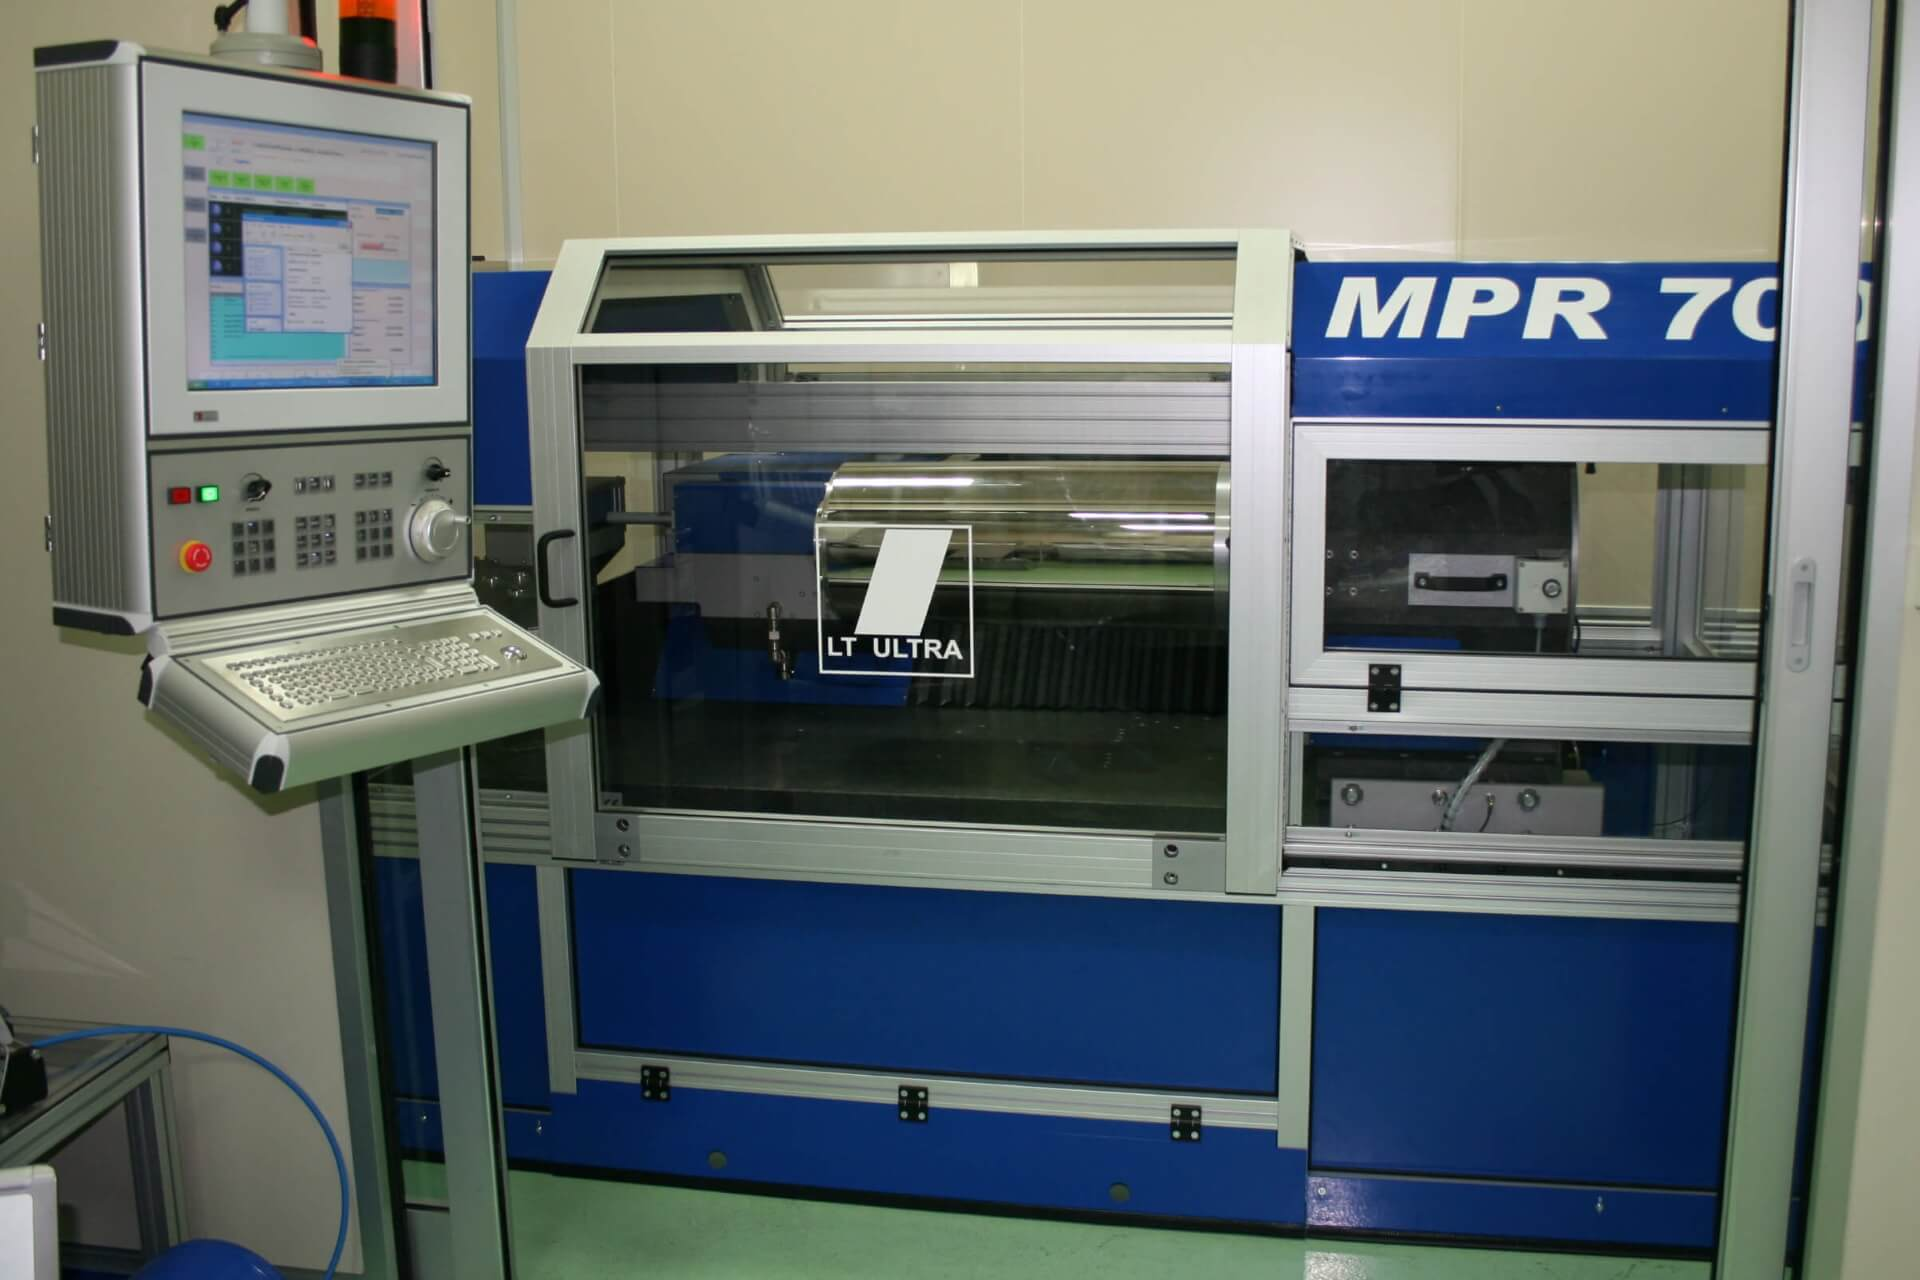 Abb.2: Masterprofilometer MPR 700 von LT Ultra